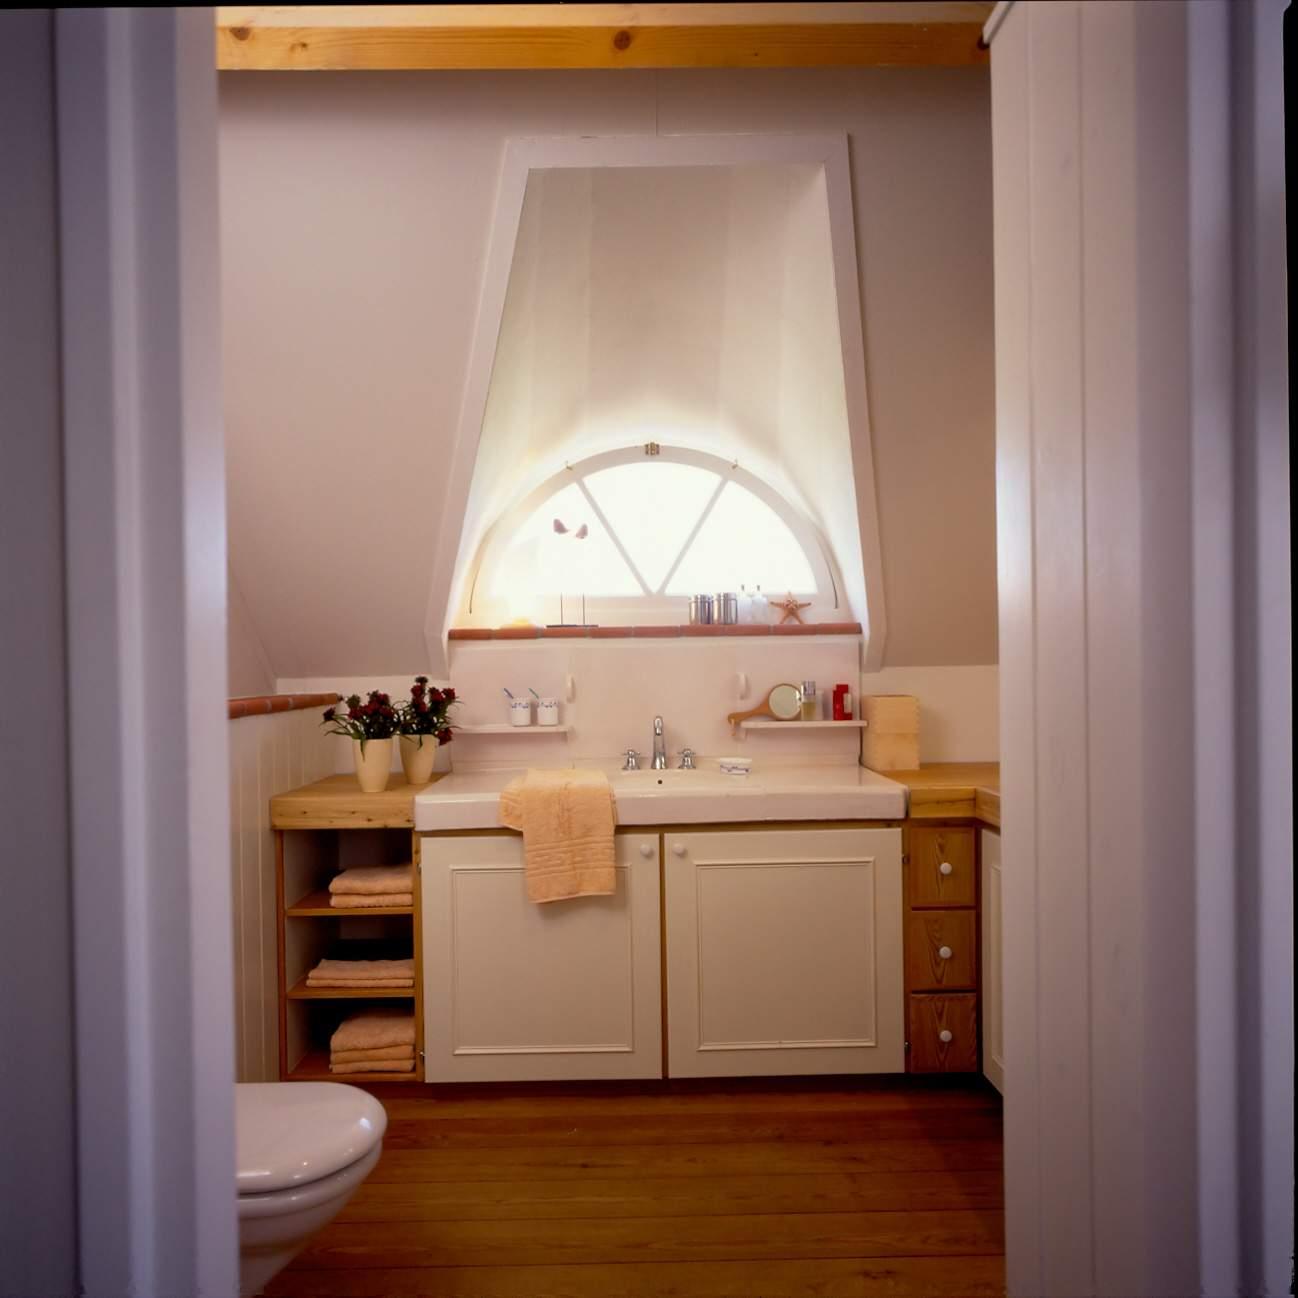 luxus ferienhaus nordsee pool sauna kamin reetdach. Black Bedroom Furniture Sets. Home Design Ideas